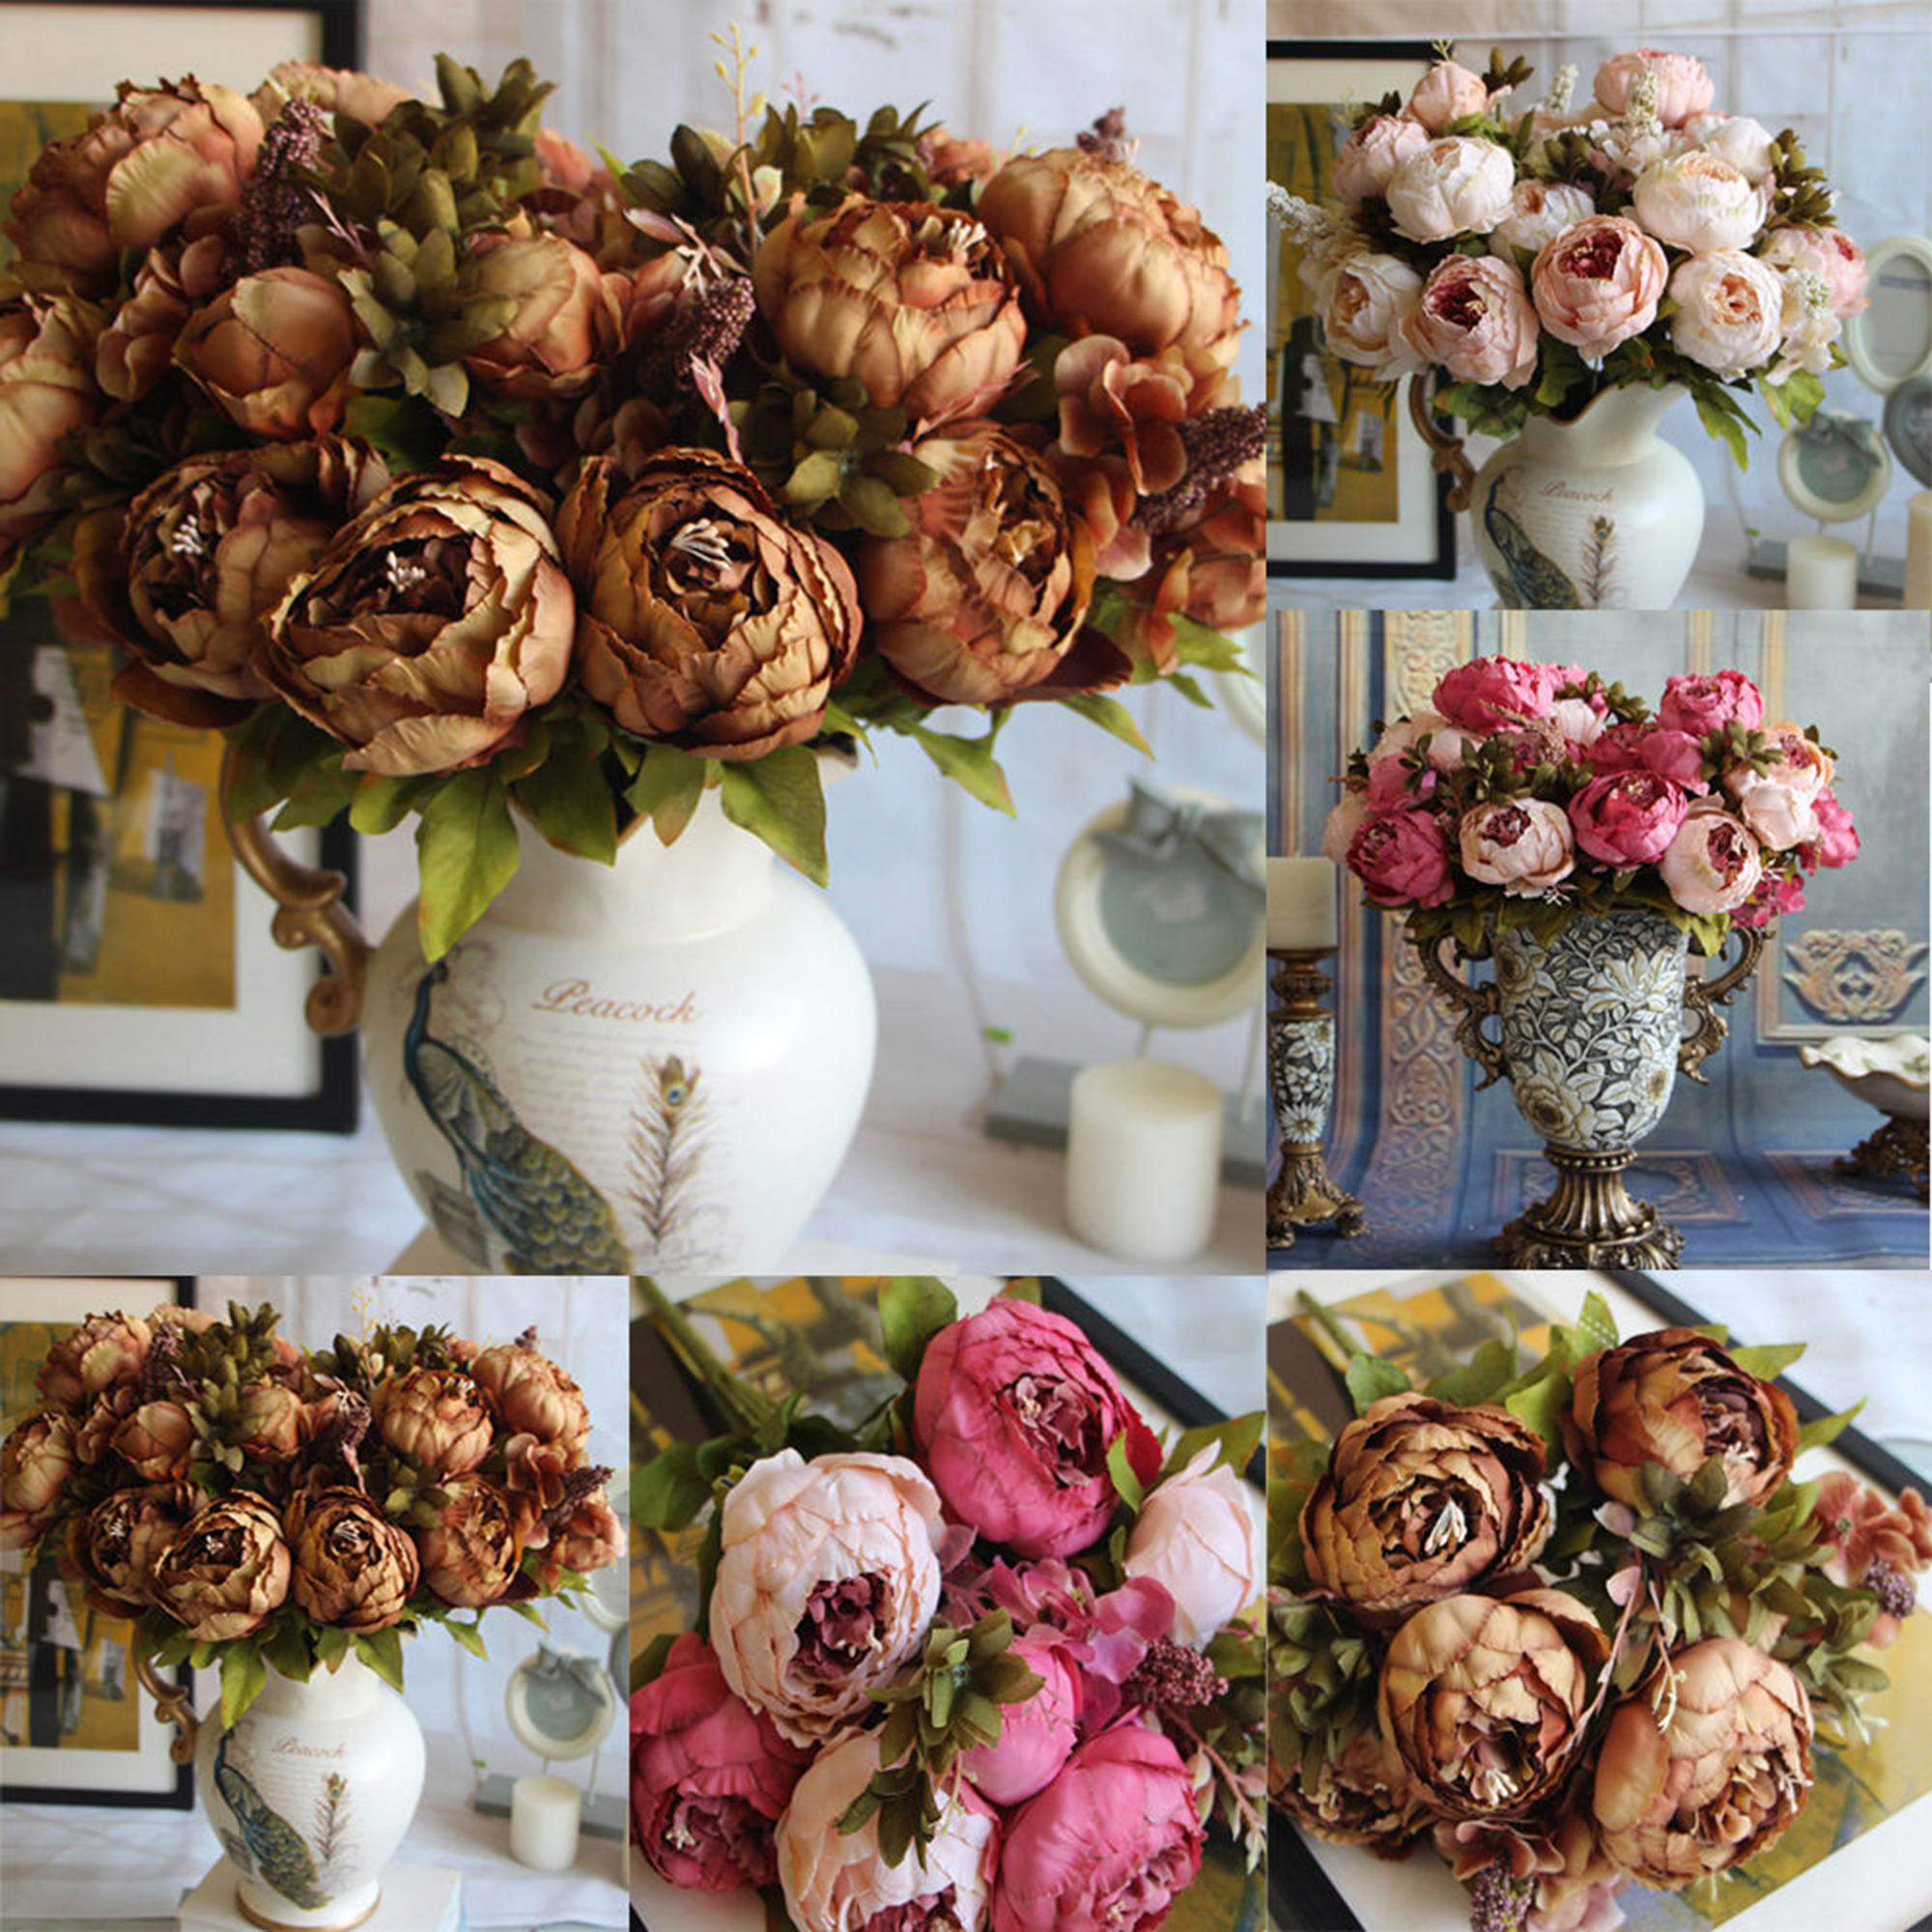 CUH Silk Flower peony Artificial Arrangements Silk Bouquet for Bedding Wedding Office Living Room Meeting Room Garden Floral